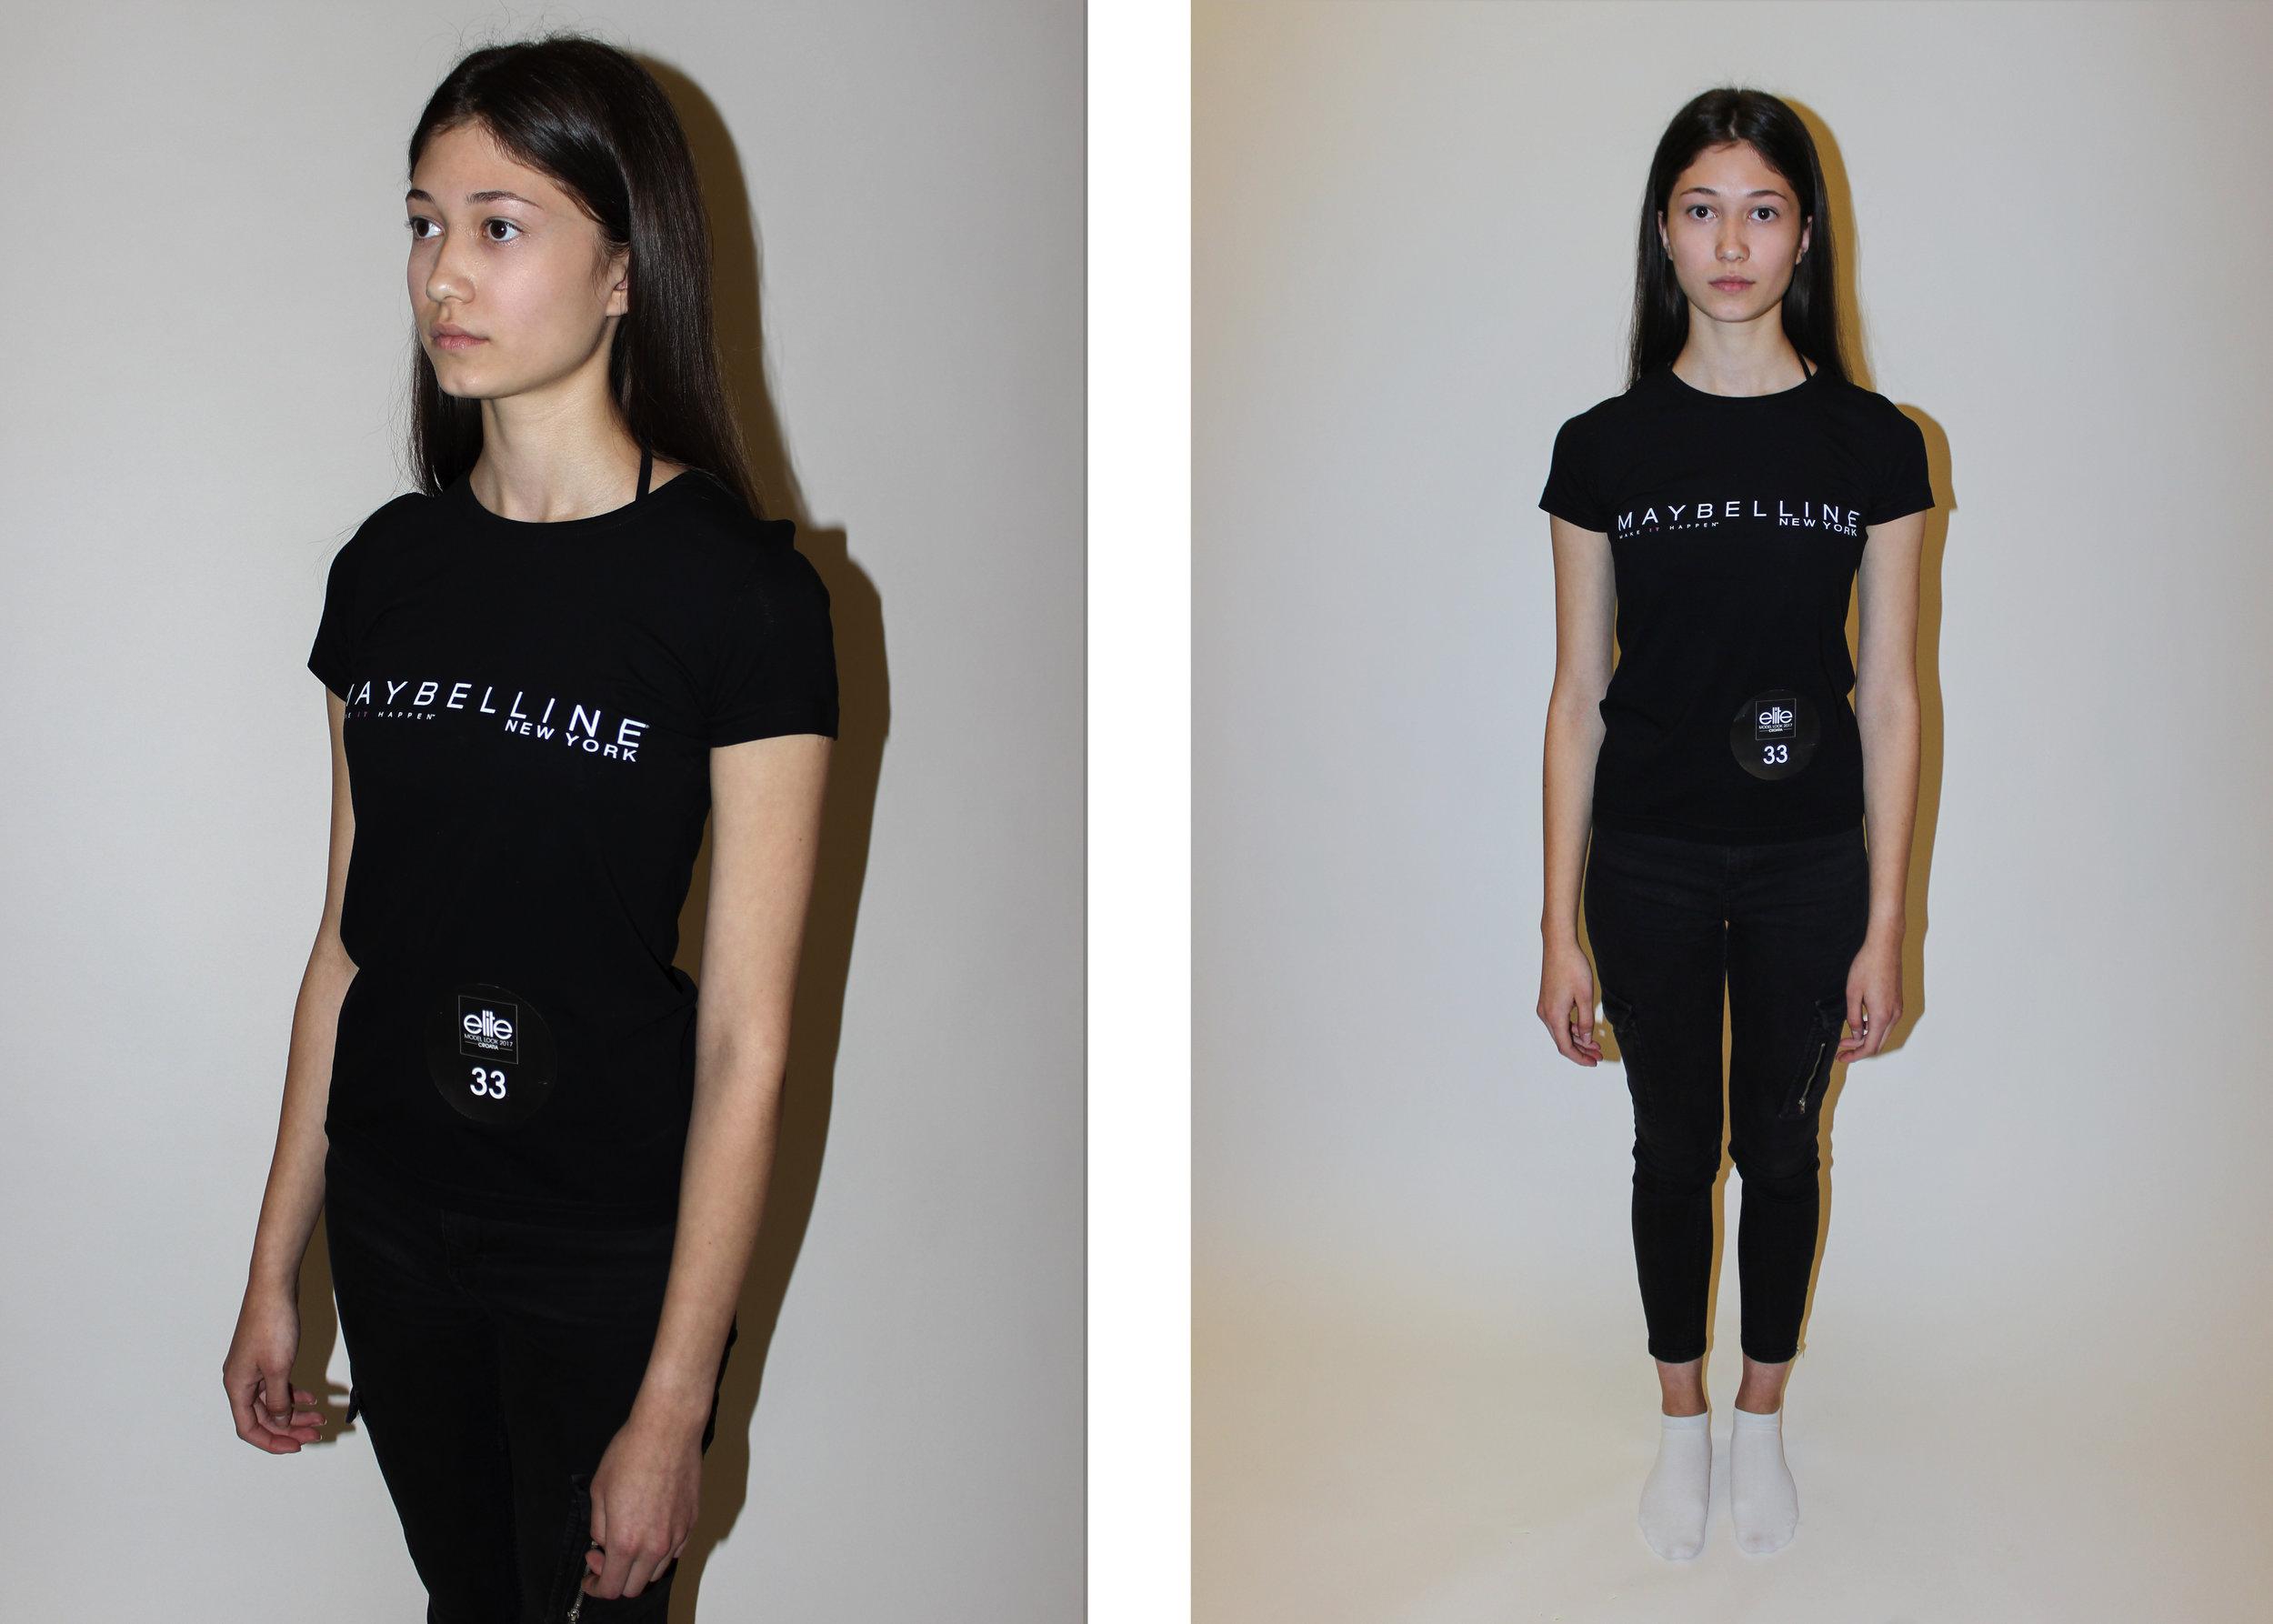 elite-model-look-agency-polaroids-expensive-reality (3).jpg